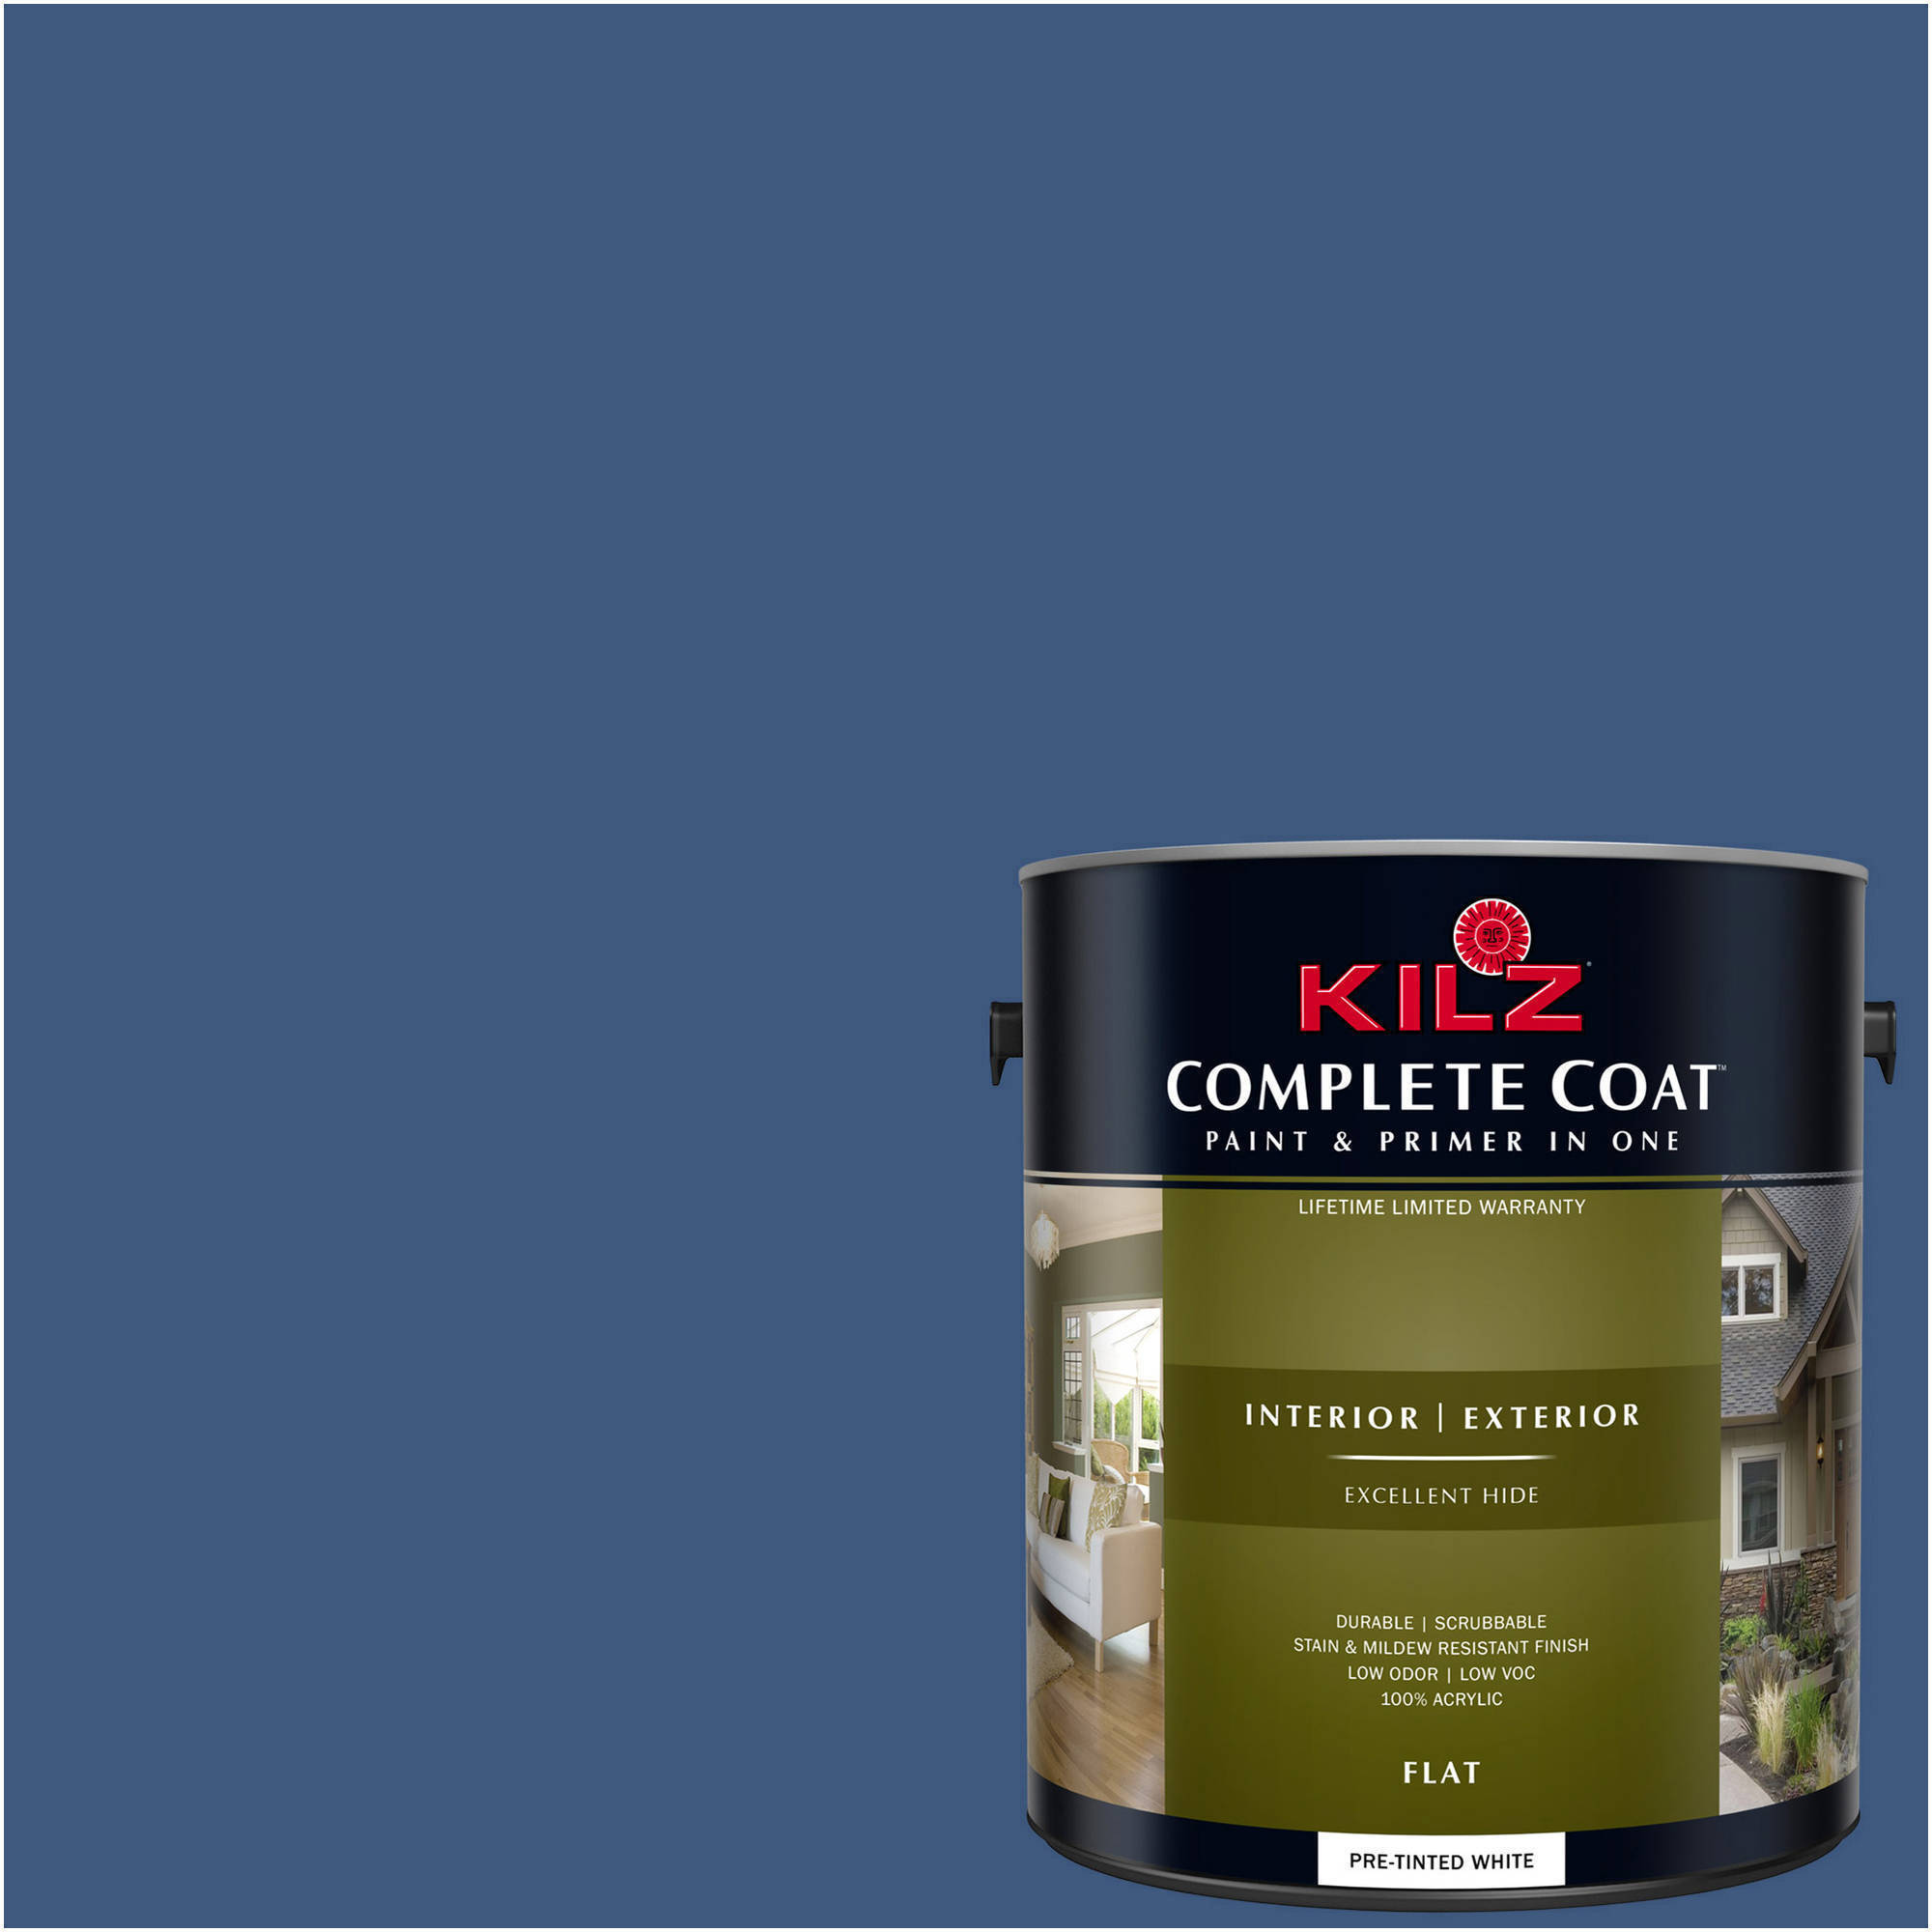 KILZ COMPLETE COAT Interior/Exterior Paint & Primer in One #RC100-01 Thunder Night